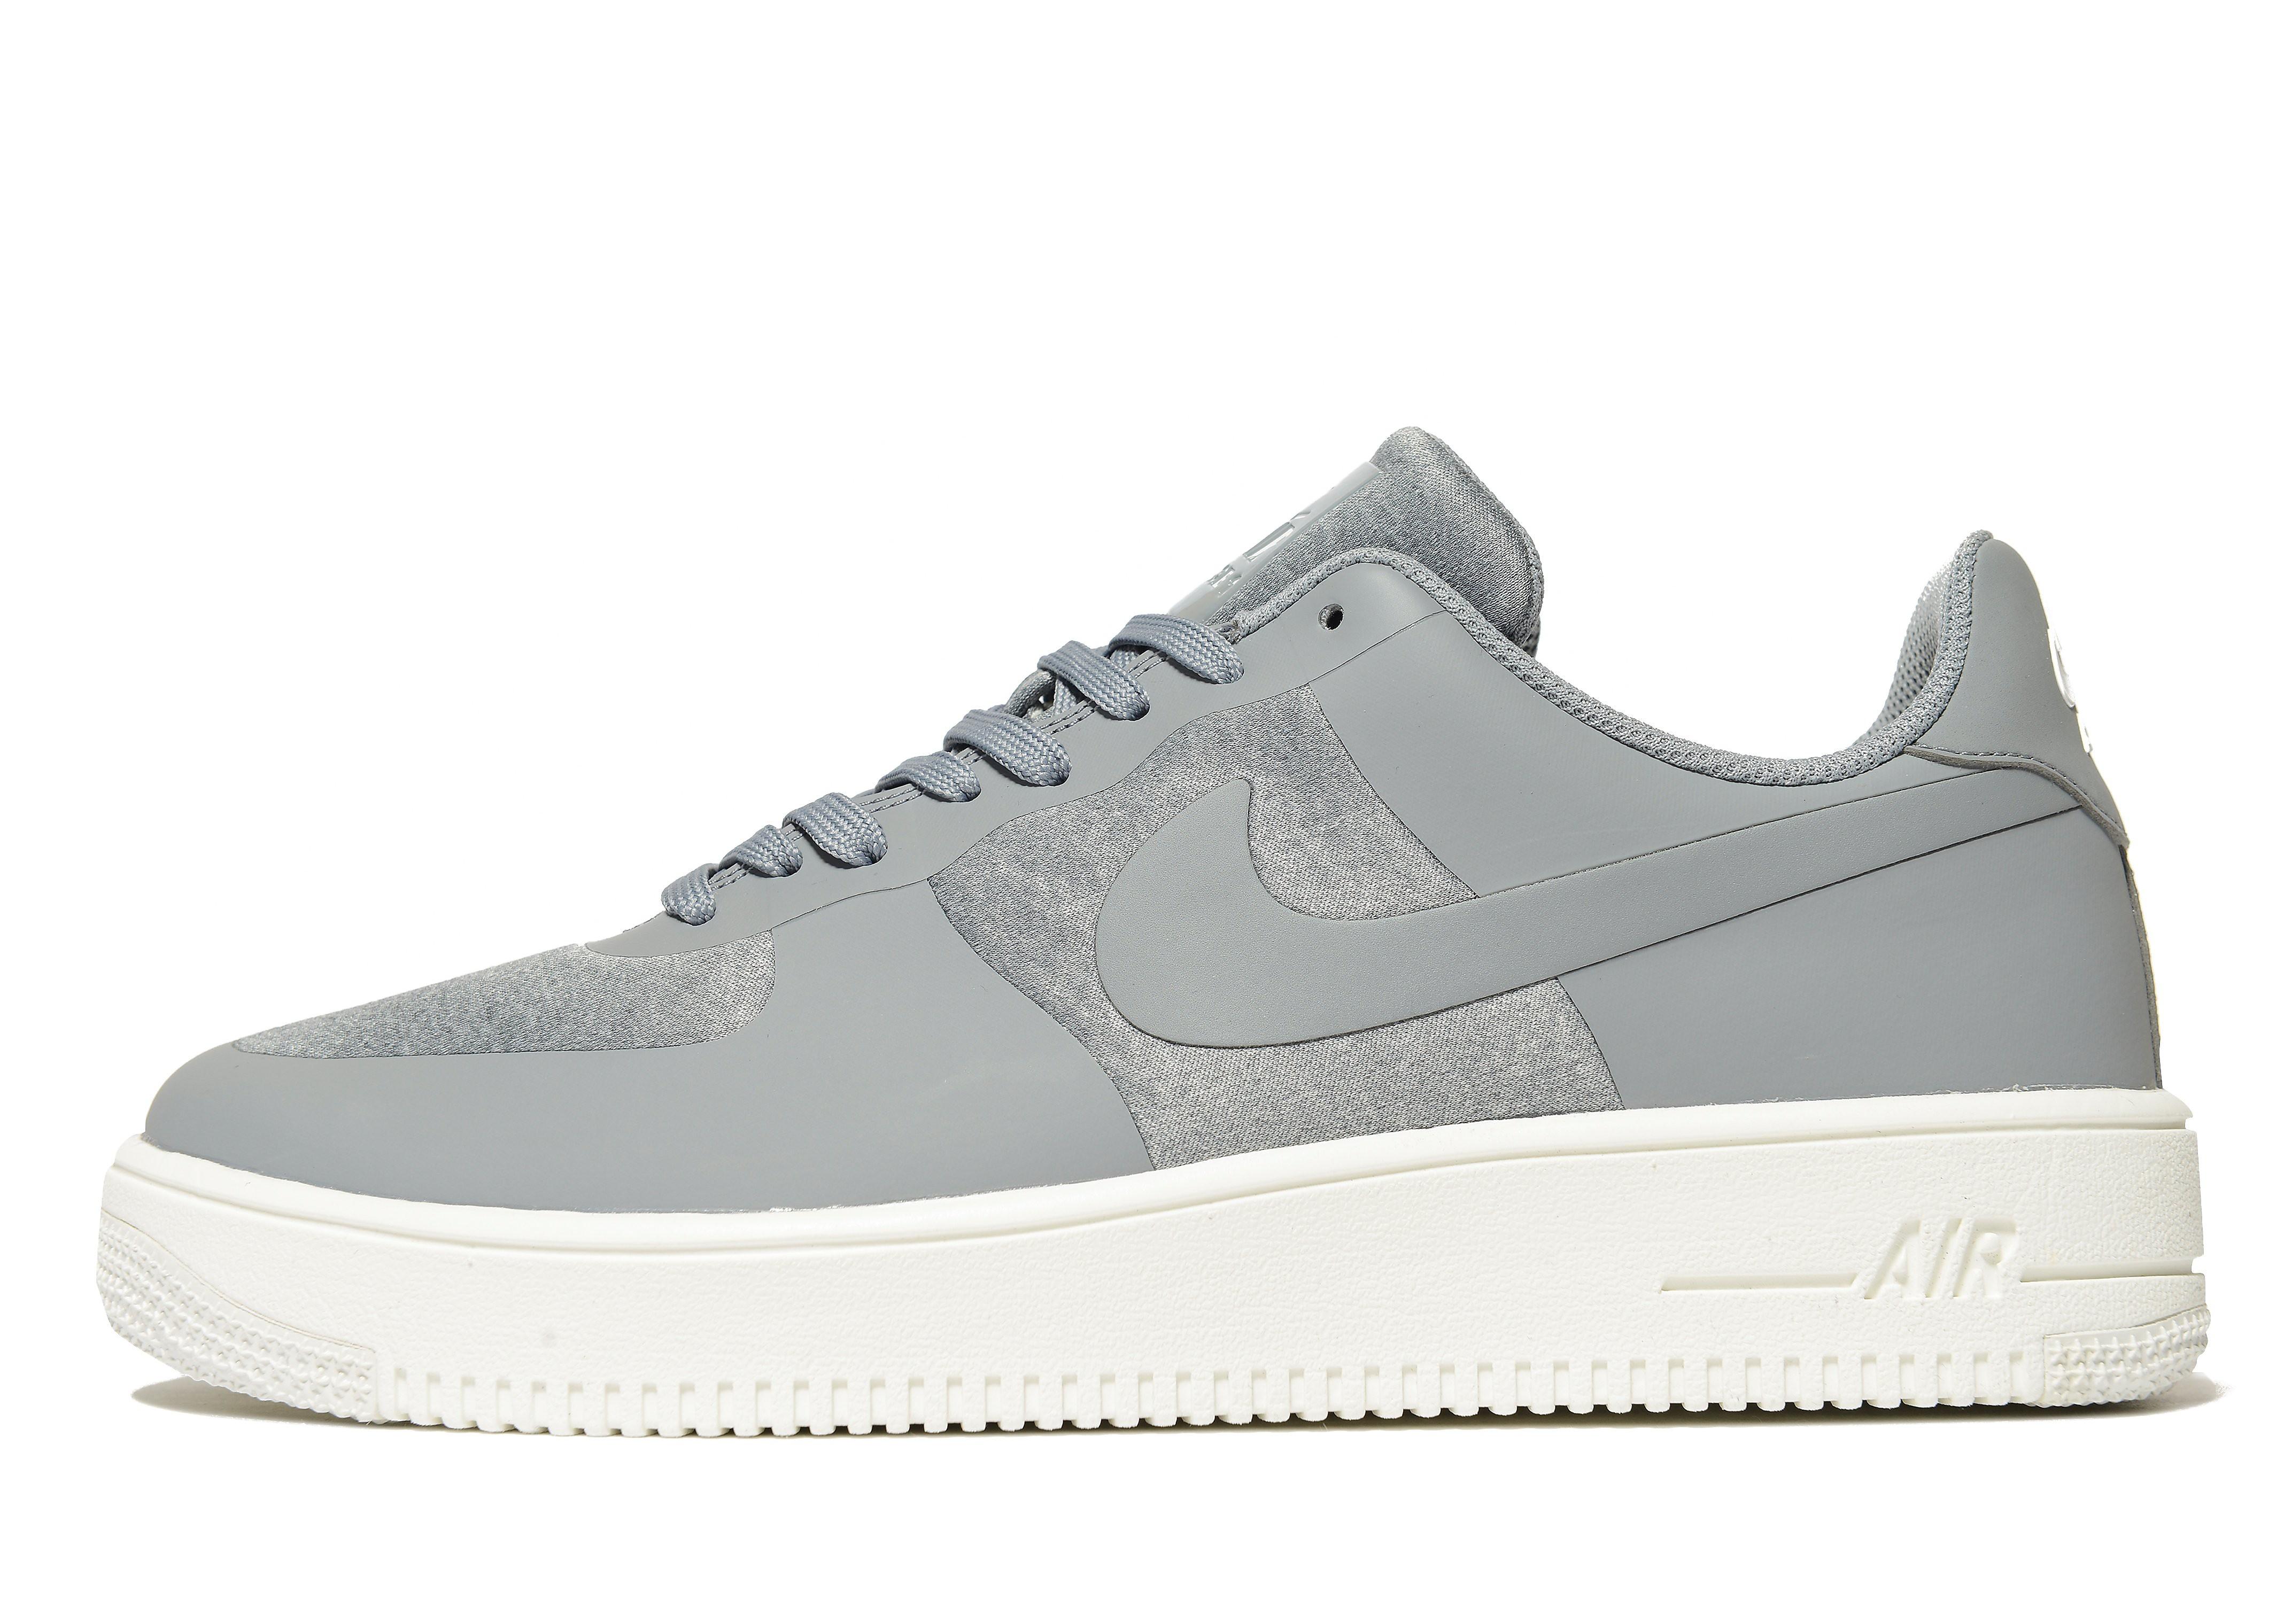 Nike Air Force 1 Ultraforce Homme